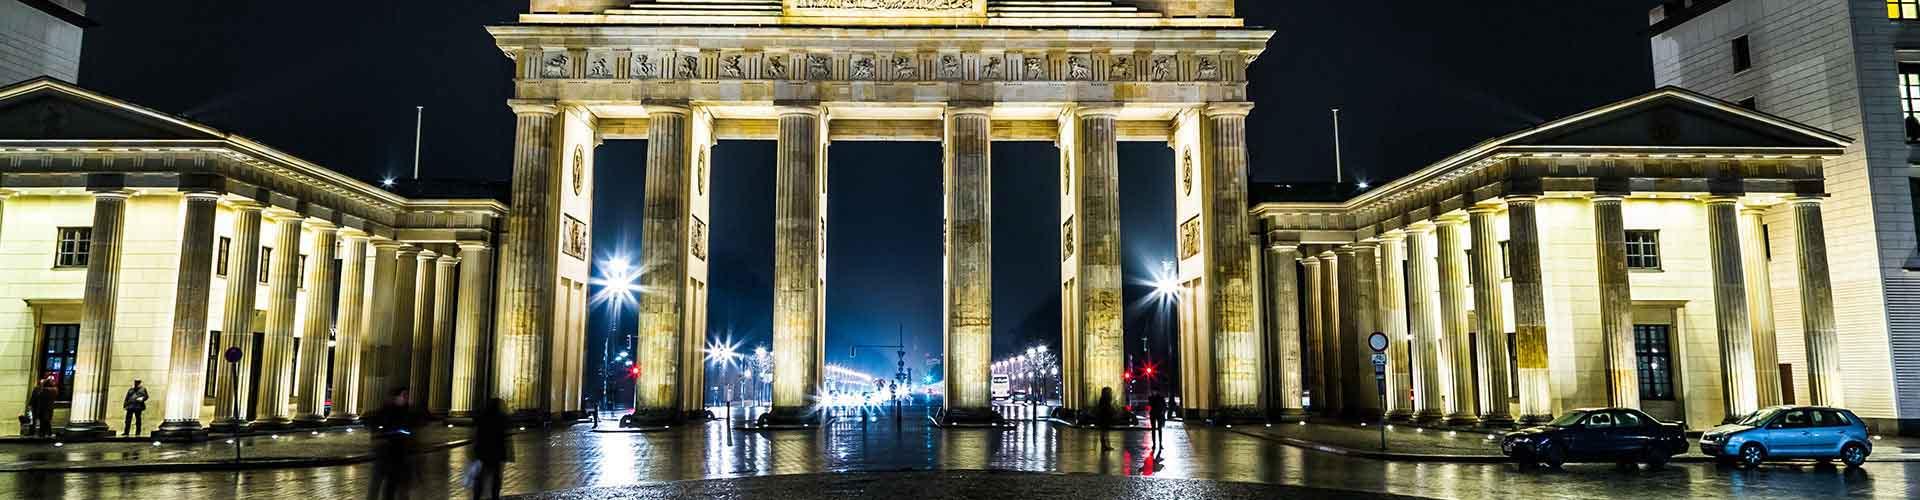 Berlino ostelli ostelli - Berlino porta di magdeburgo ...